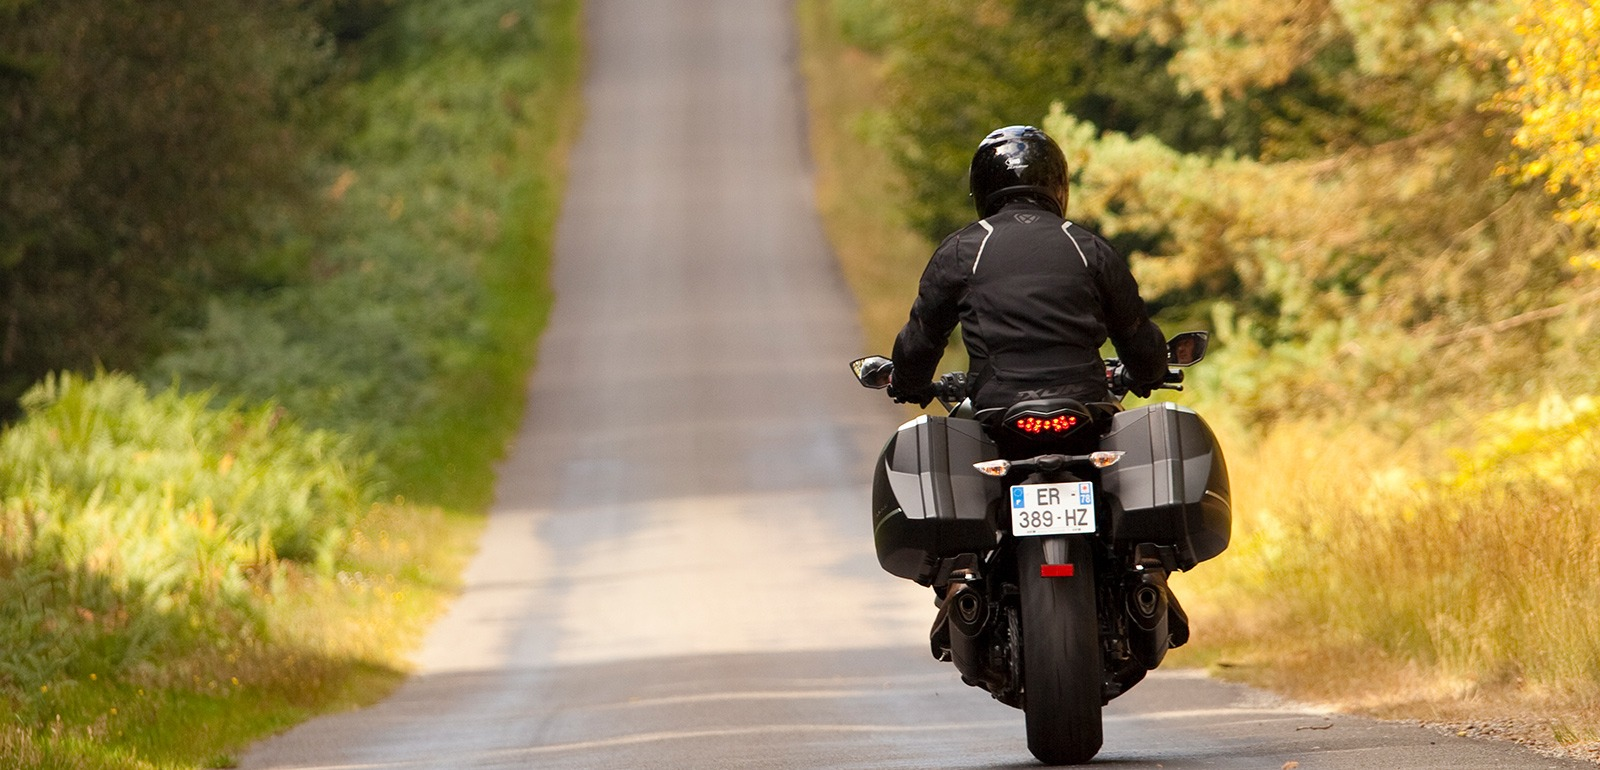 Balades Moto Orne © Frederique Hughes